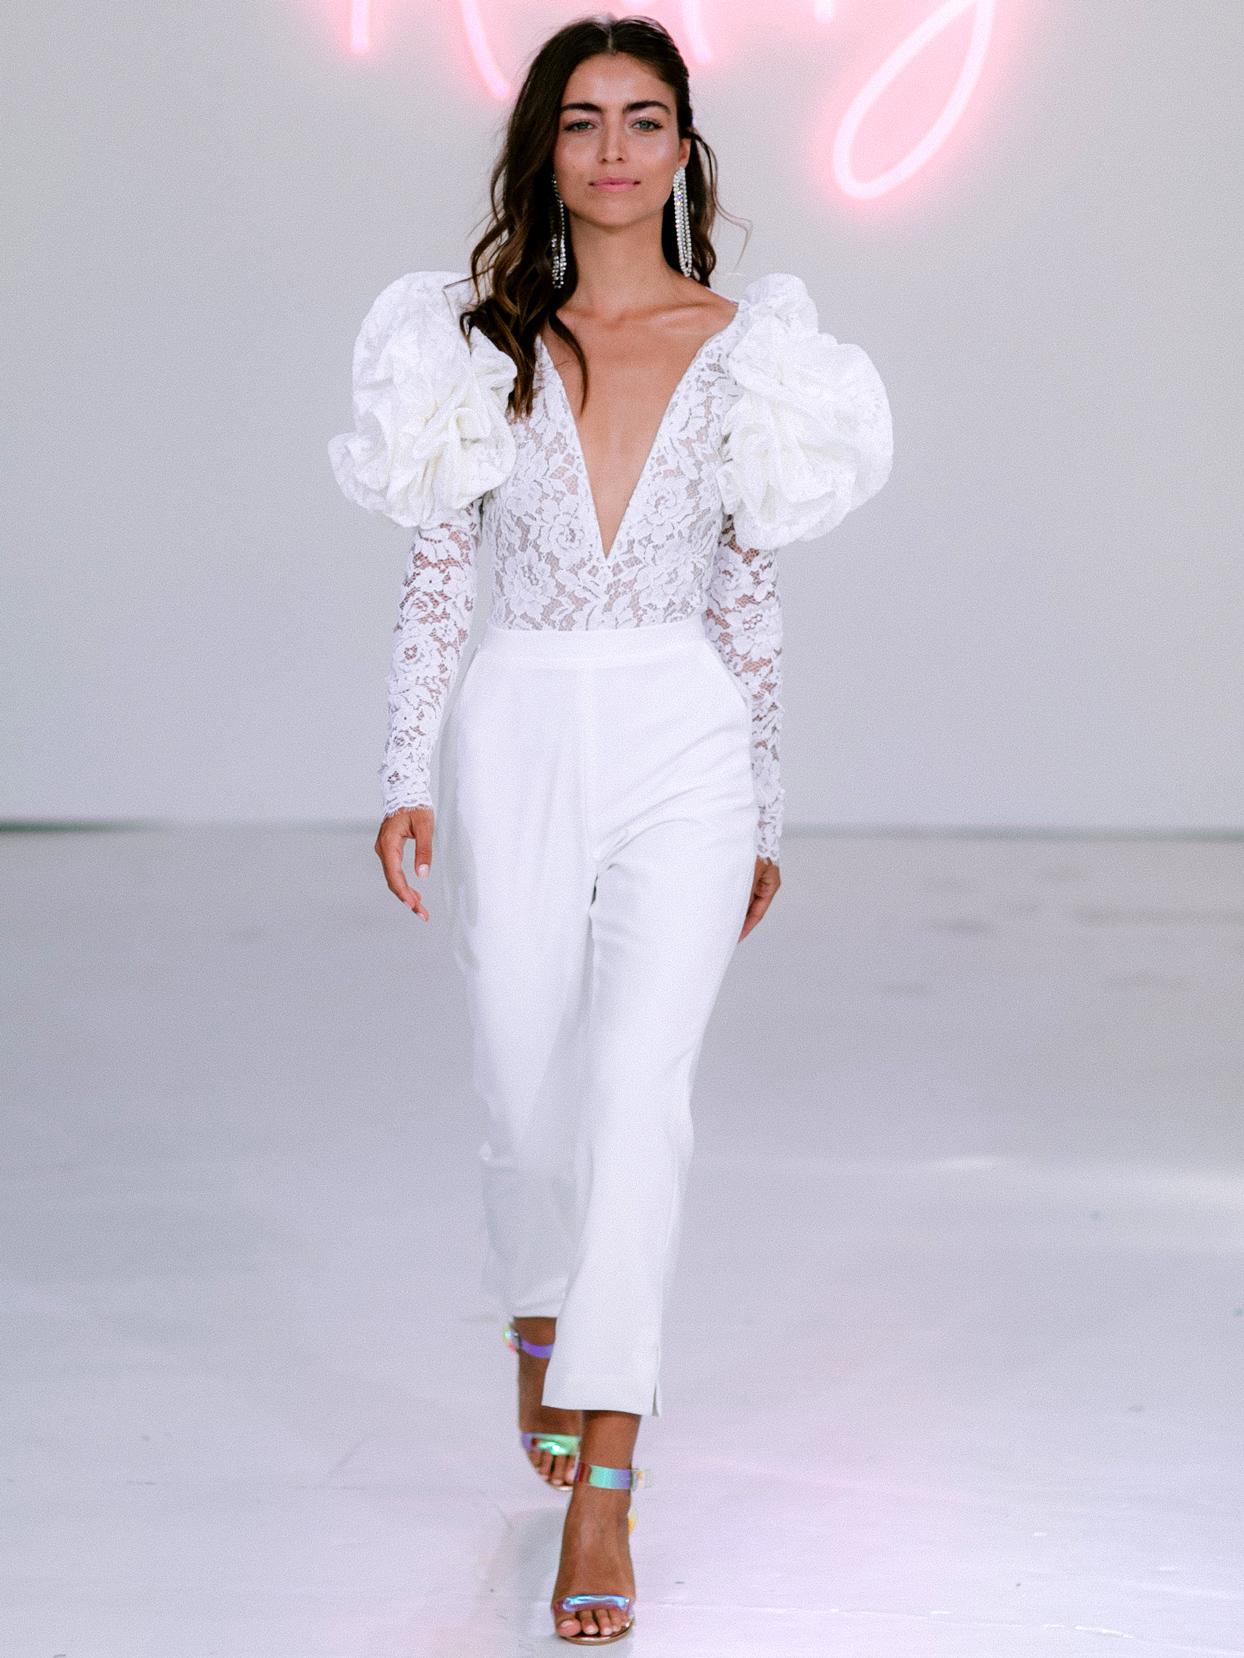 Rime Arodaky X The Mews Bridal puffed lace long sleeves jumpsuit wedding dress fall 2020